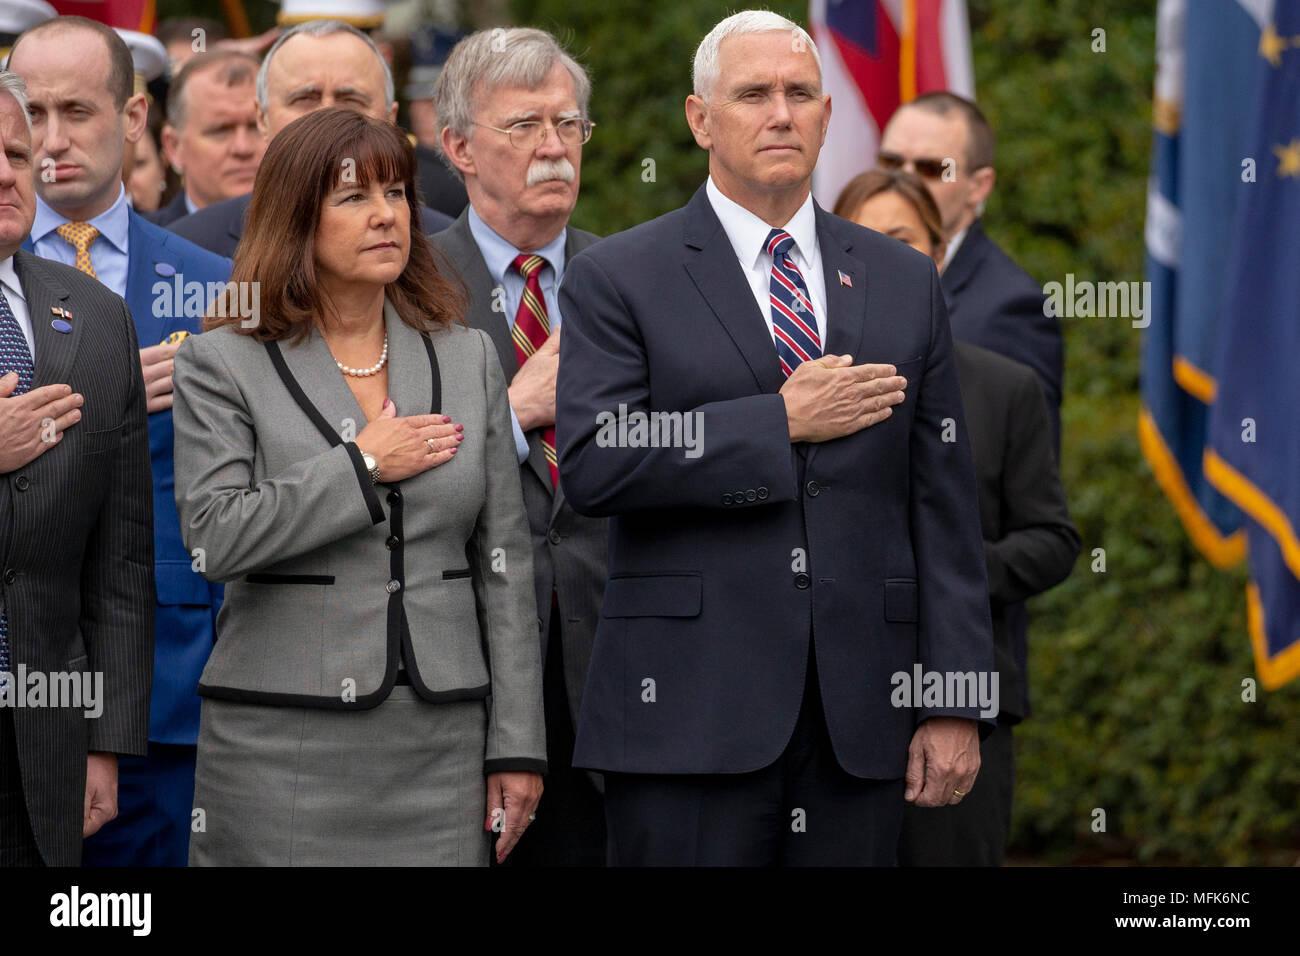 Washington, DC. 24th Apr, 2018. United States Vice President Mike ...